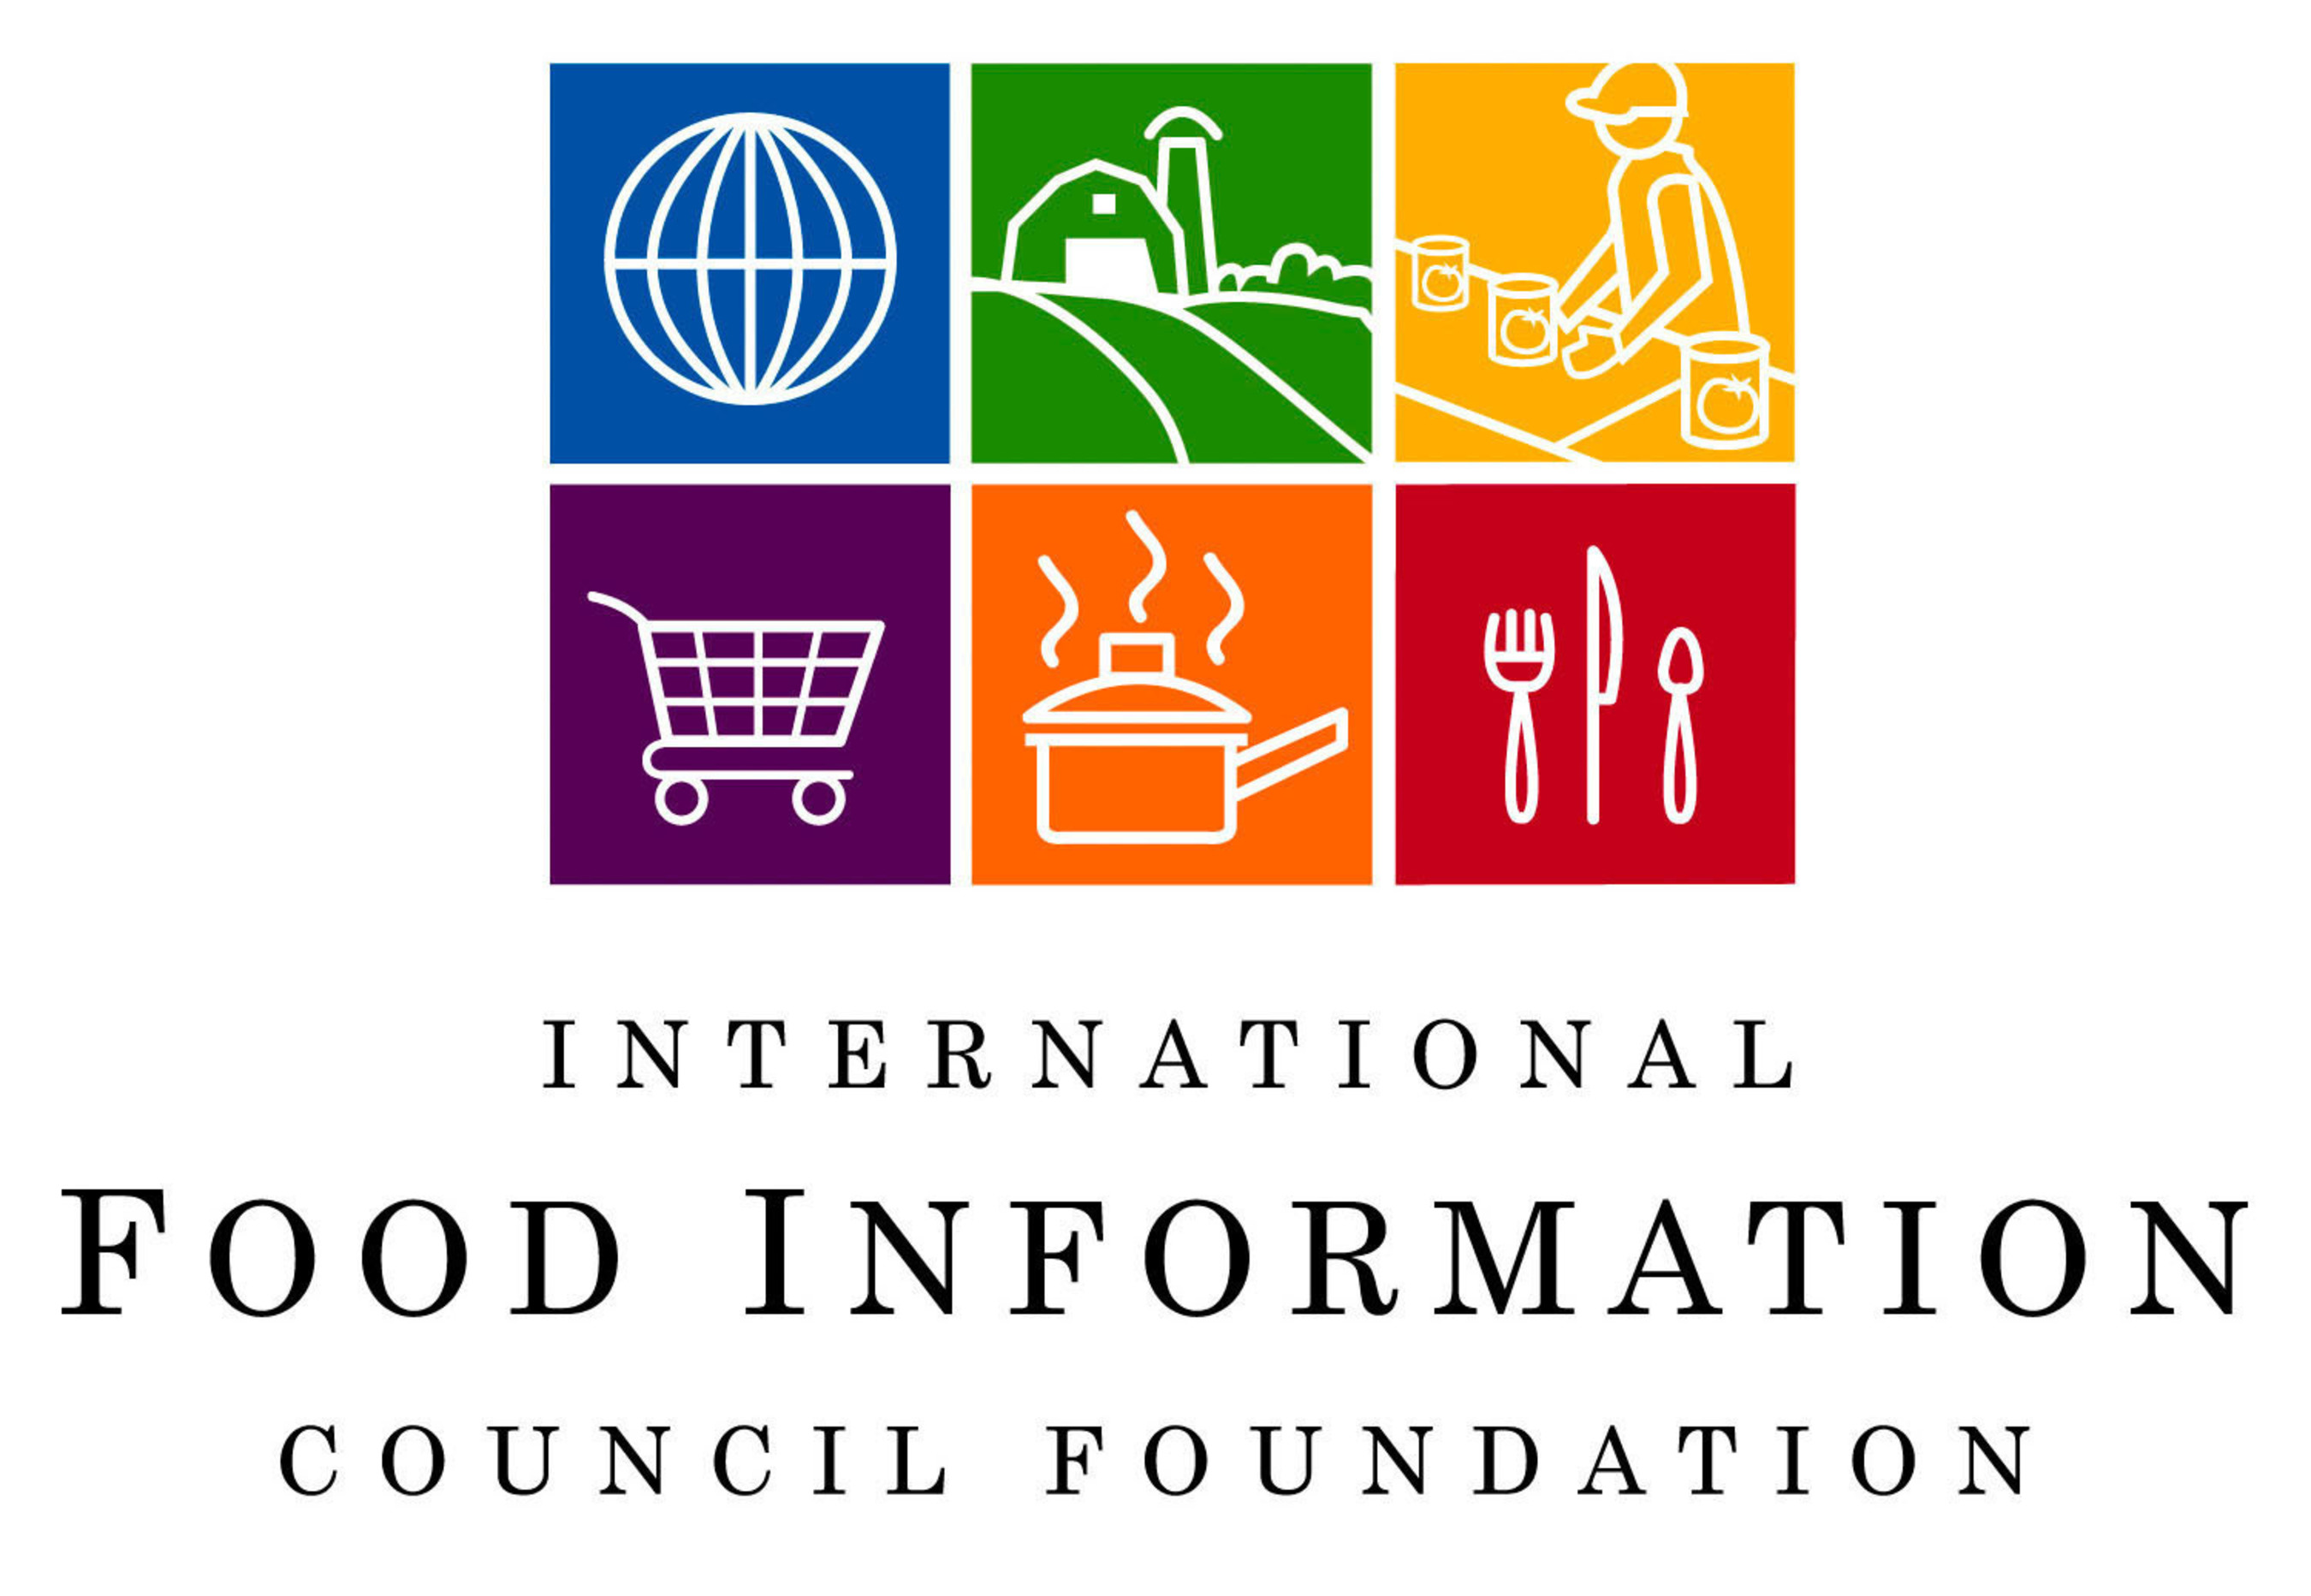 International Food Information Council Foundation Logo.